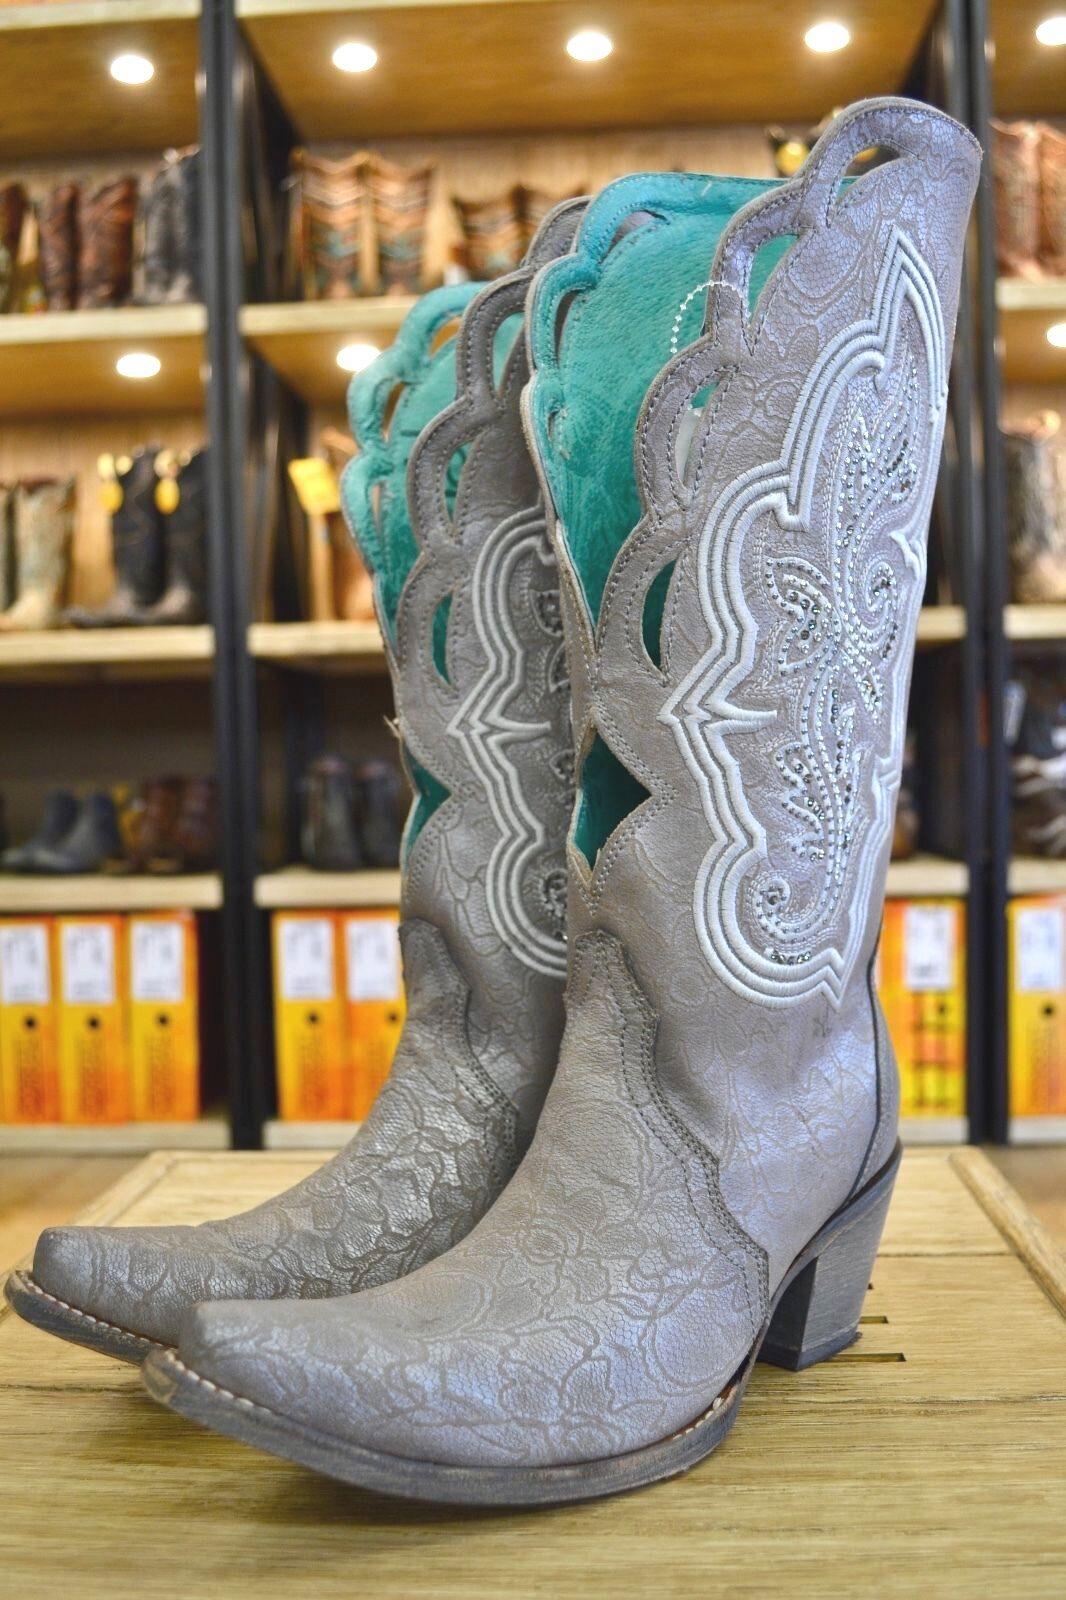 Corral Ladies Silver Embroidery & Swarovski Crystal Snip Toe Western Boots C3202